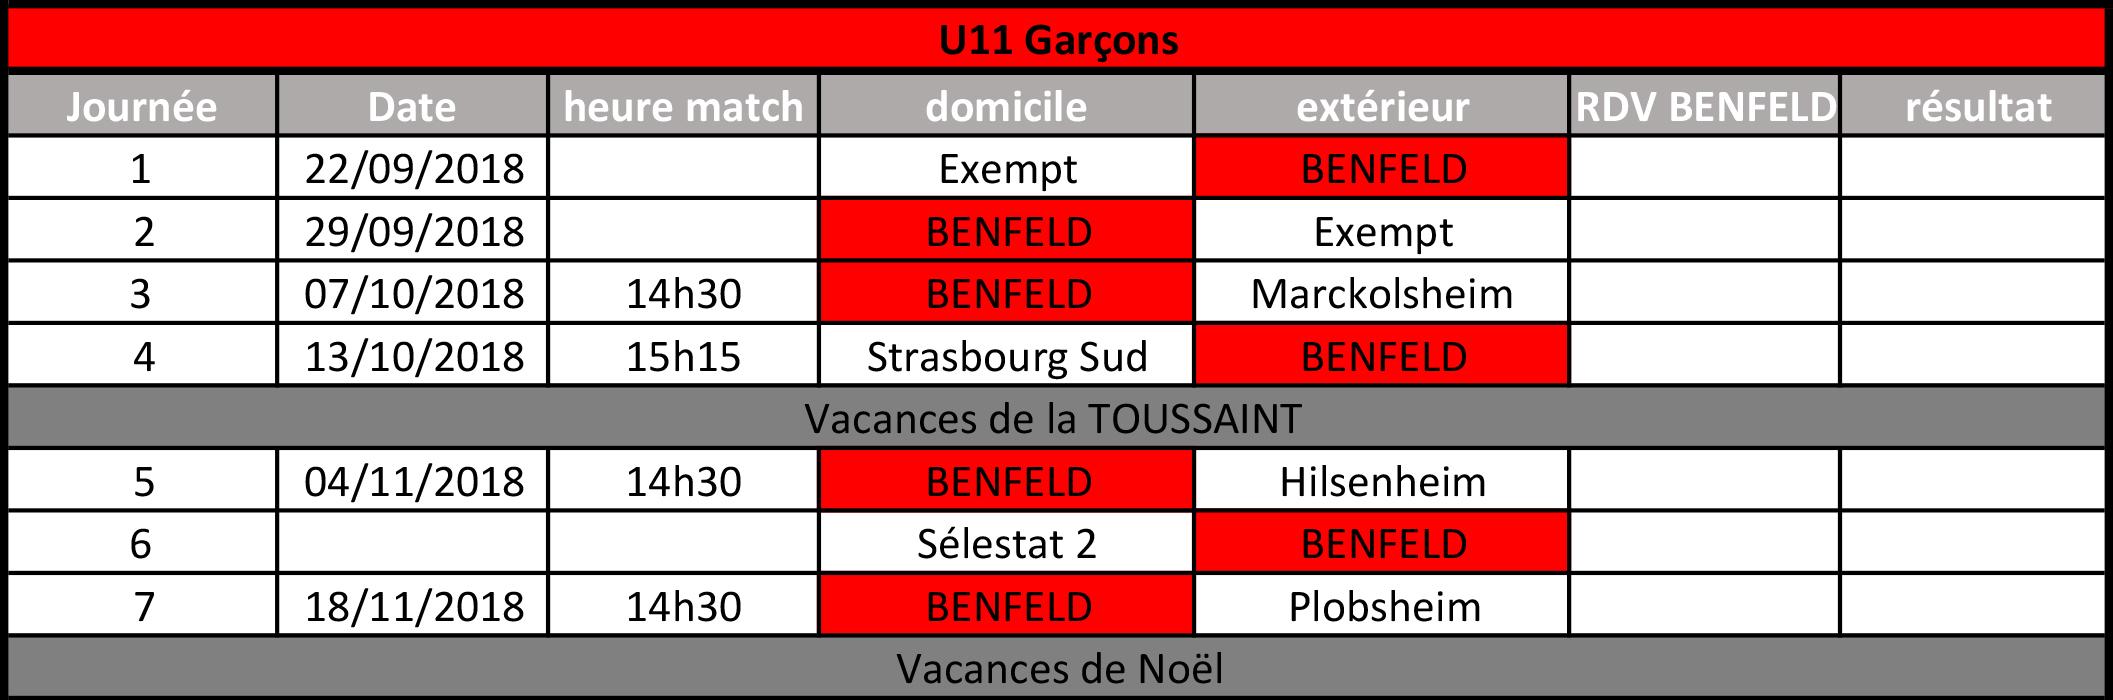 Calendrier U11 Garçons.jpg